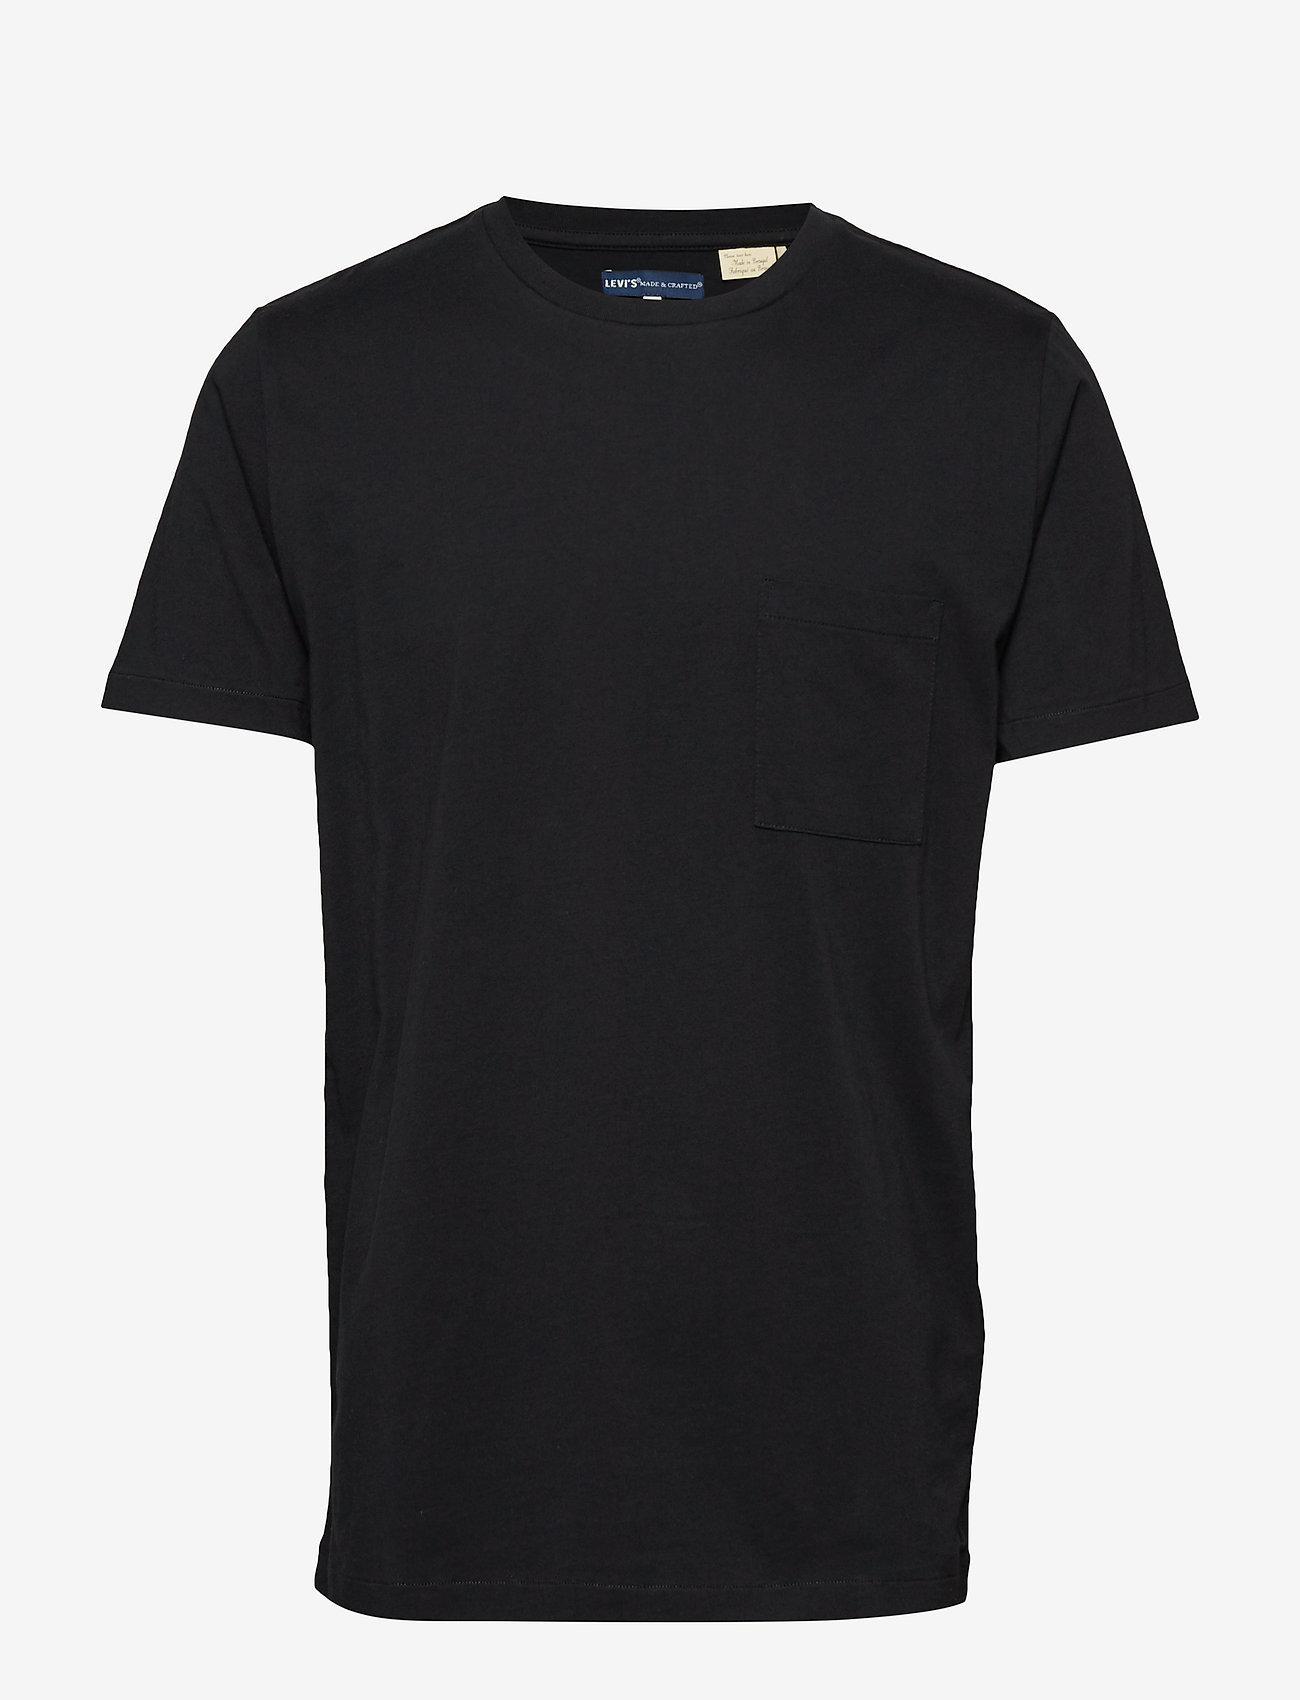 Levi's Made & Crafted - LMC POCKET TEE LMC CAVIAR BLAC - podstawowe koszulki - blacks - 0